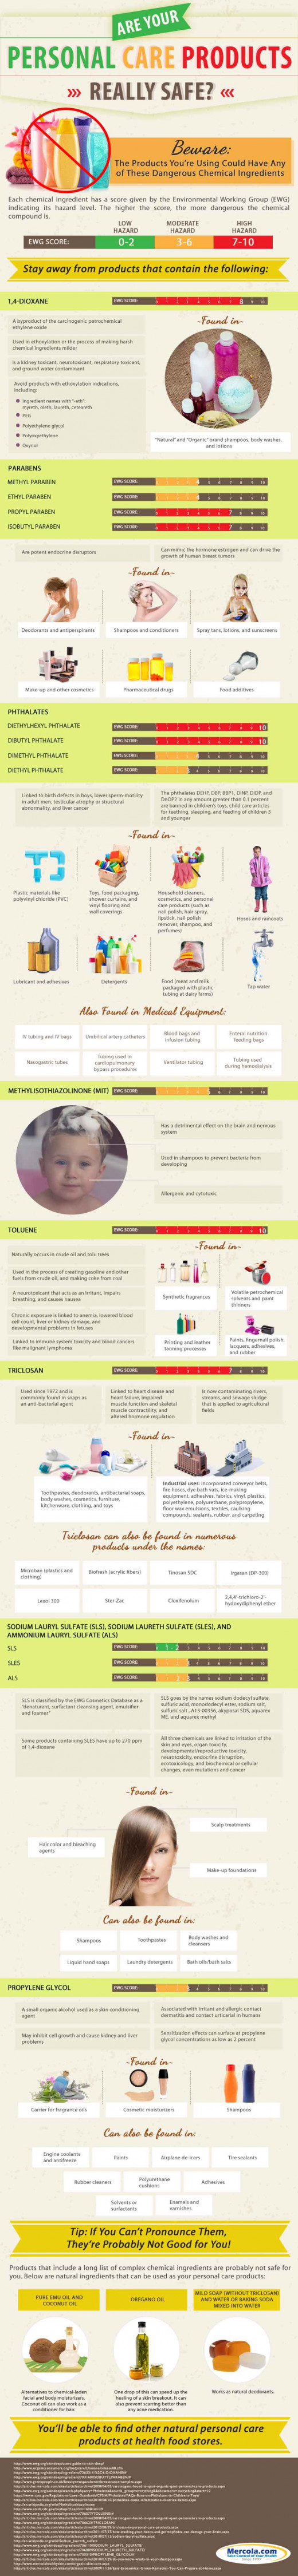 Hidden dangers in cosmetic products